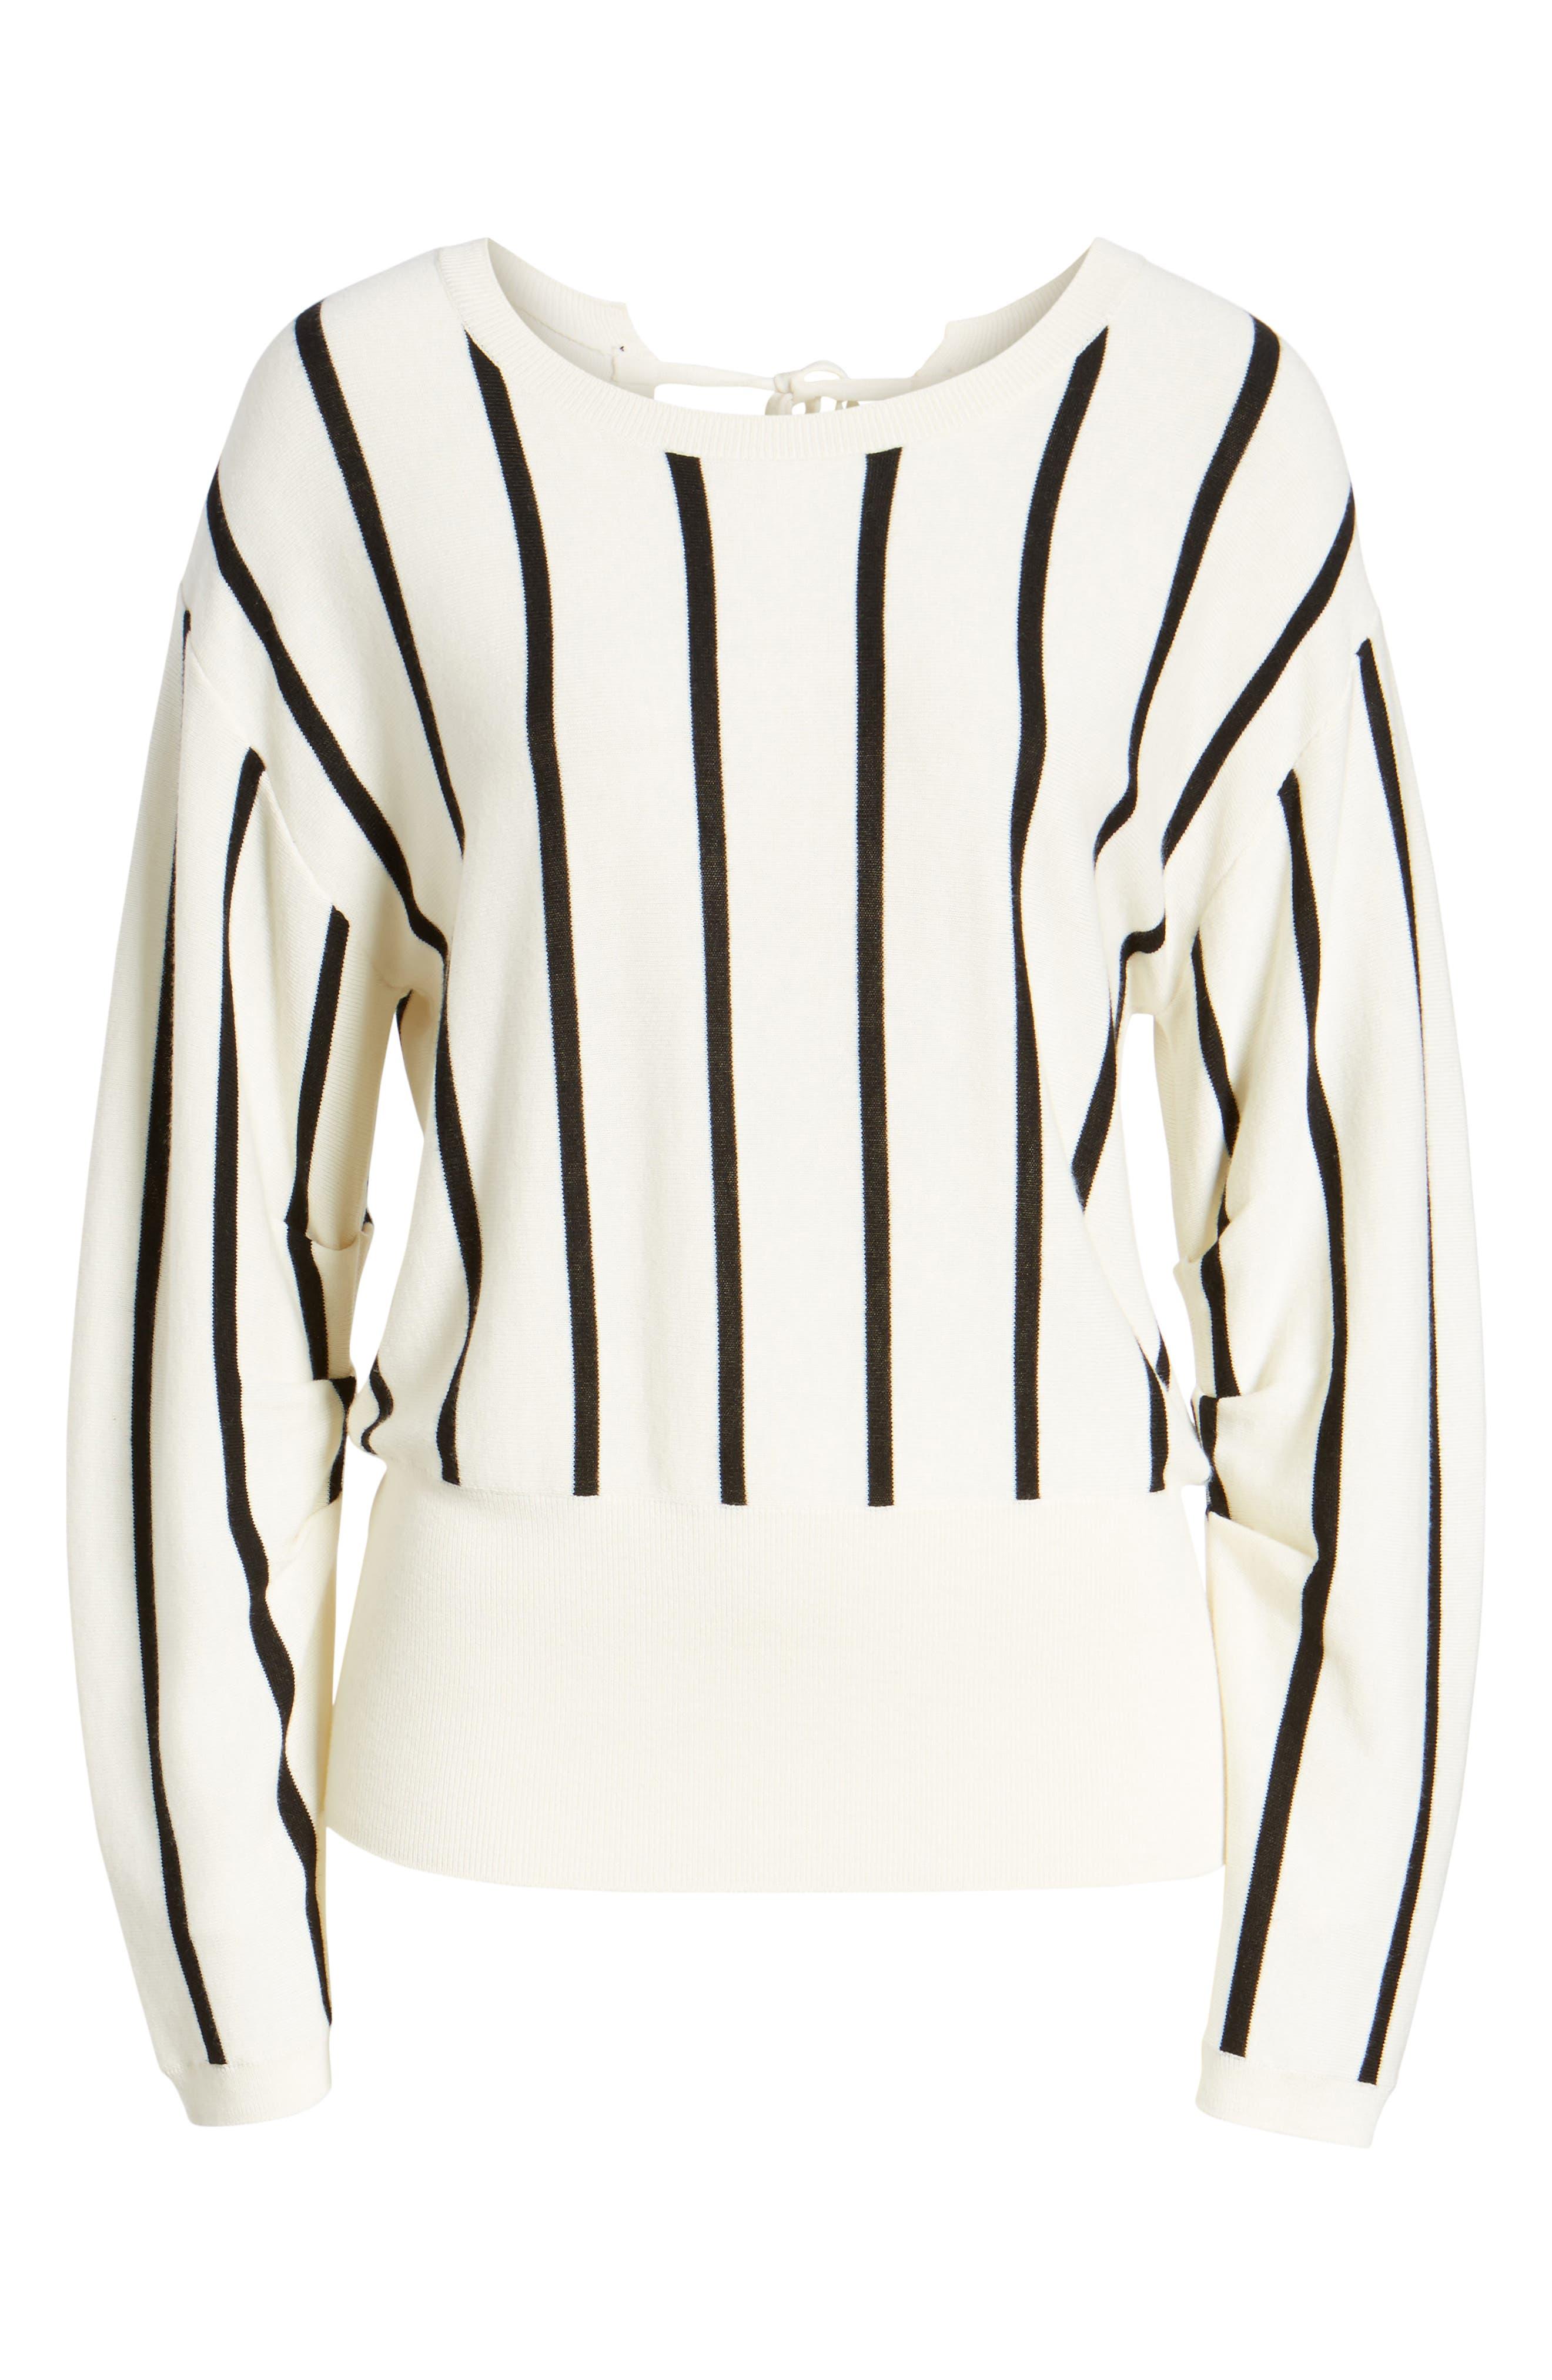 Vertical Stripe Sweater,                             Alternate thumbnail 6, color,                             Ivory/ Black Becky Stripe